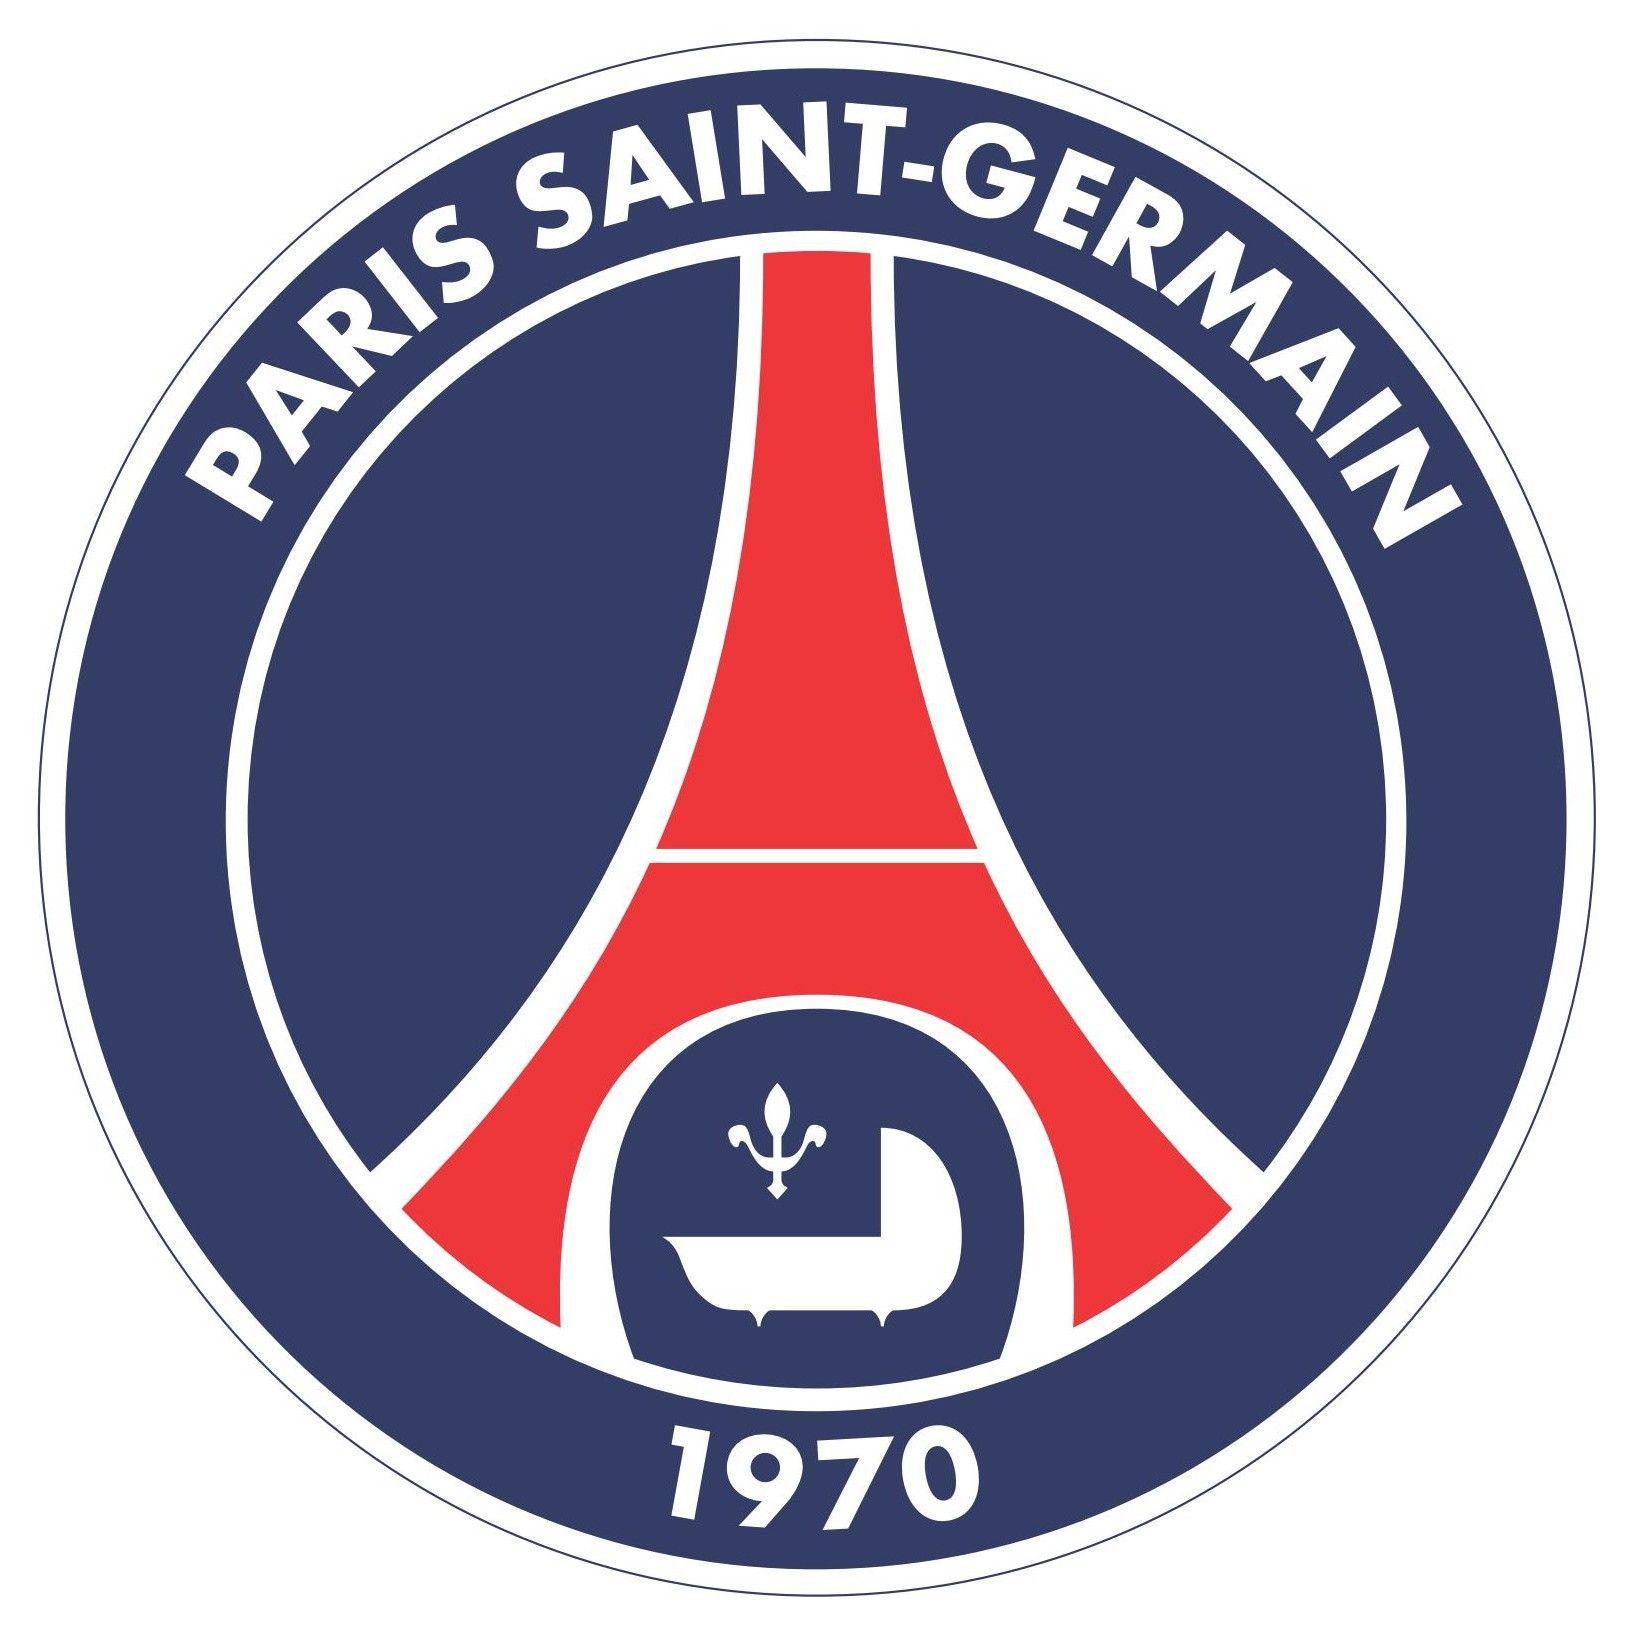 My favorite soccer team Paris Saint-Germain FC